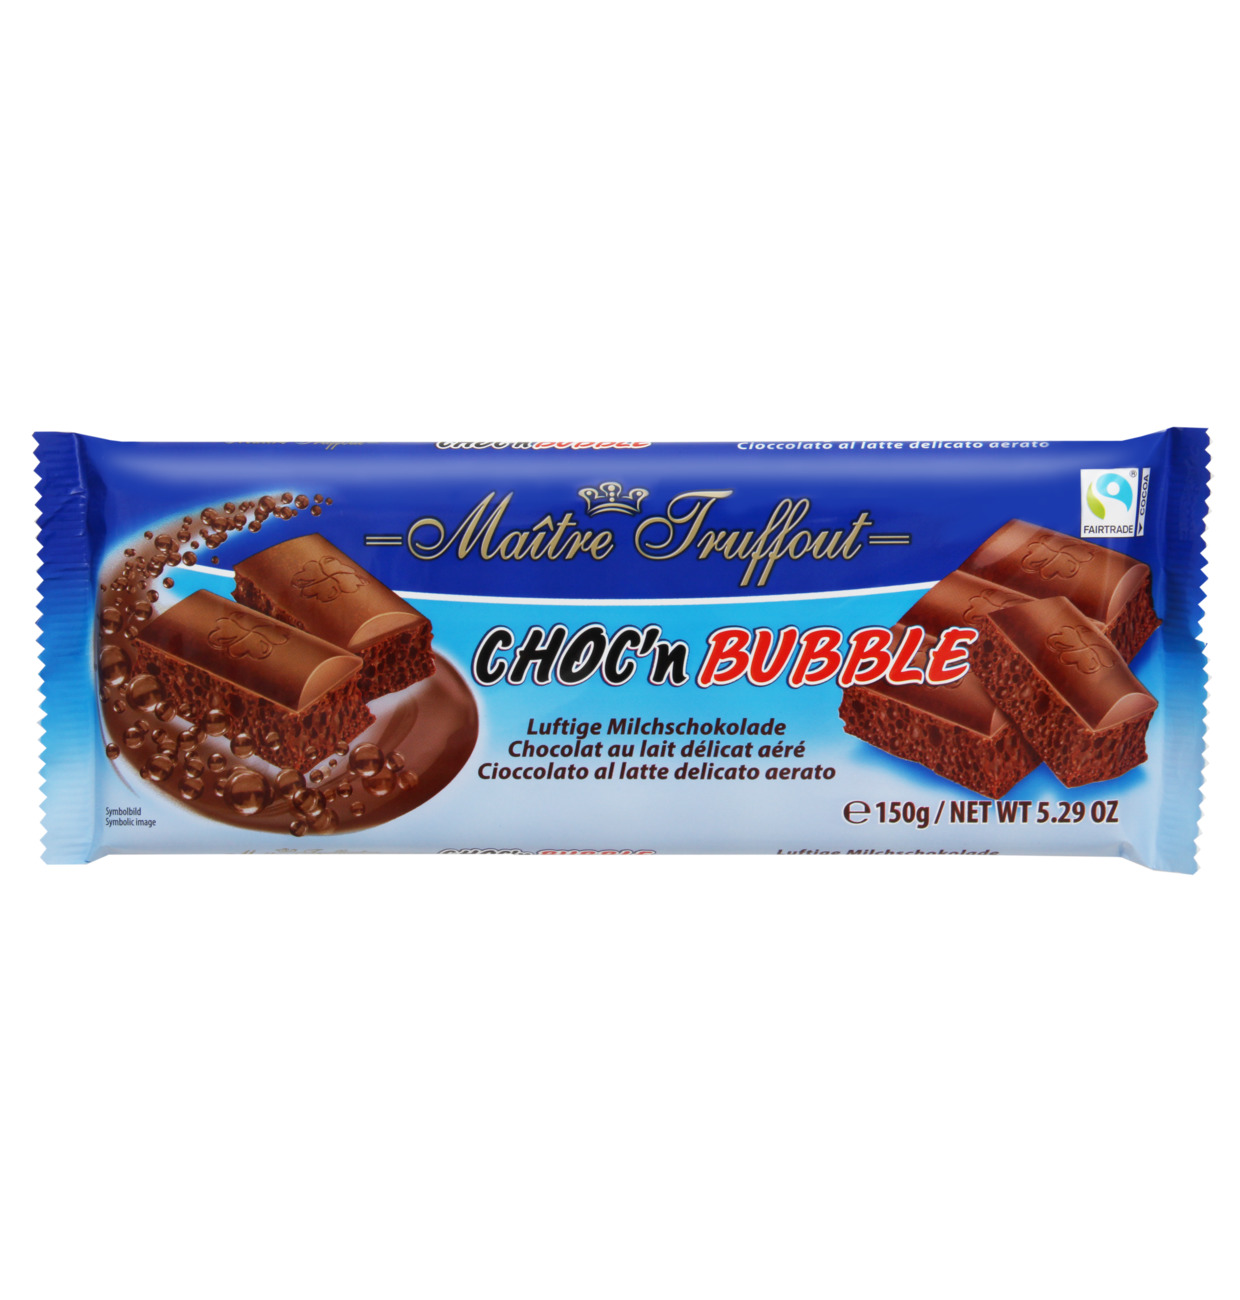 Choc´n Air luftige Milchschokolade